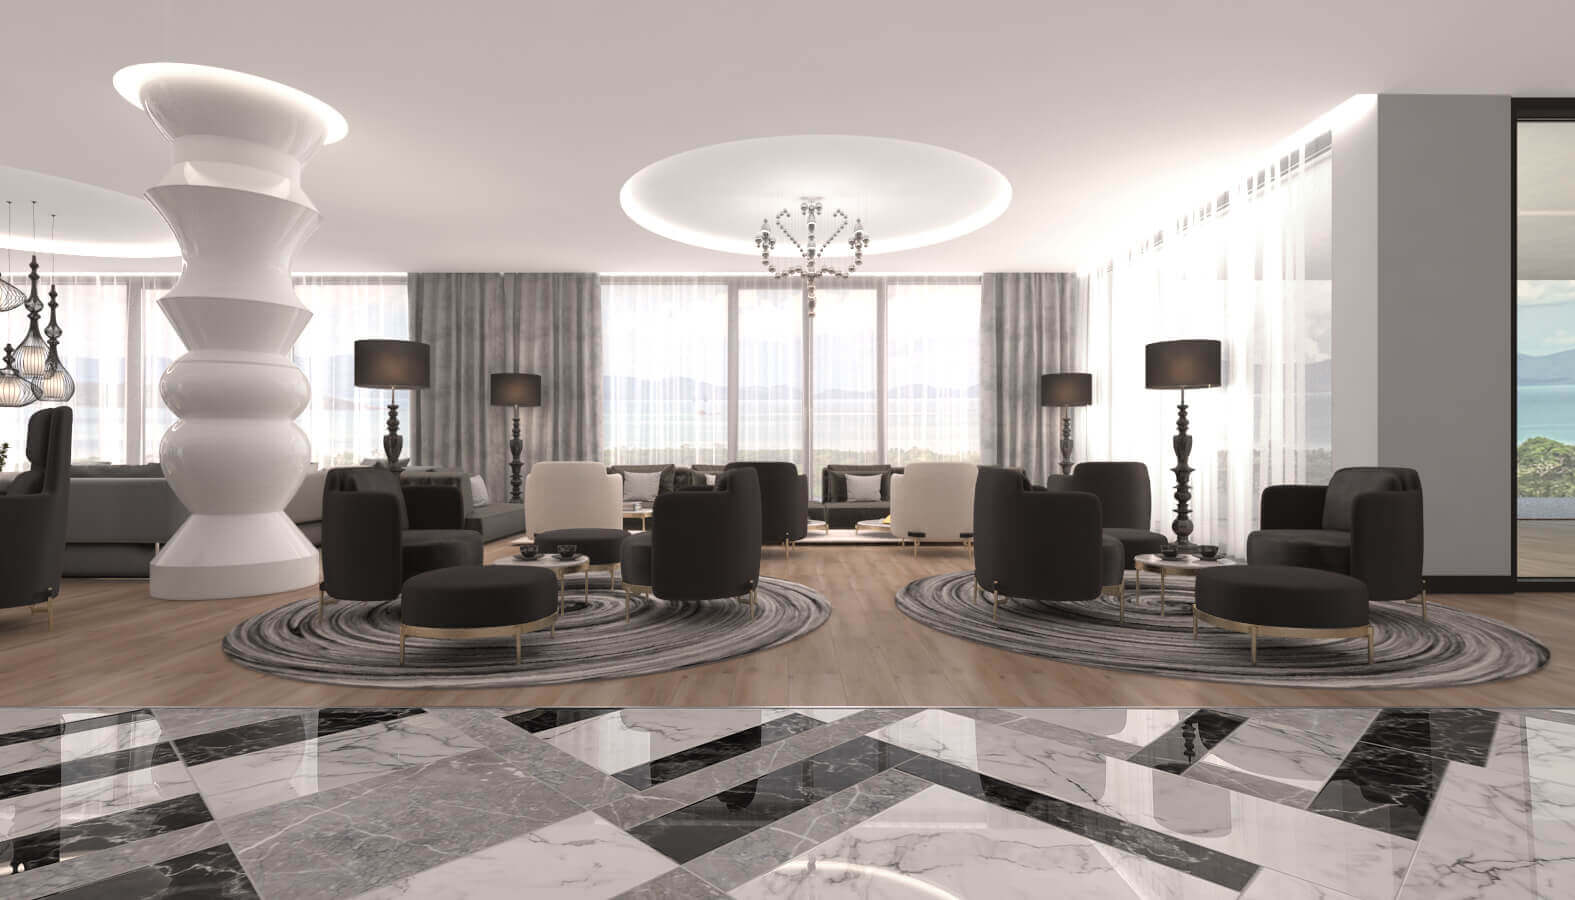 Ören 3583 Dogruer hotel Hotels